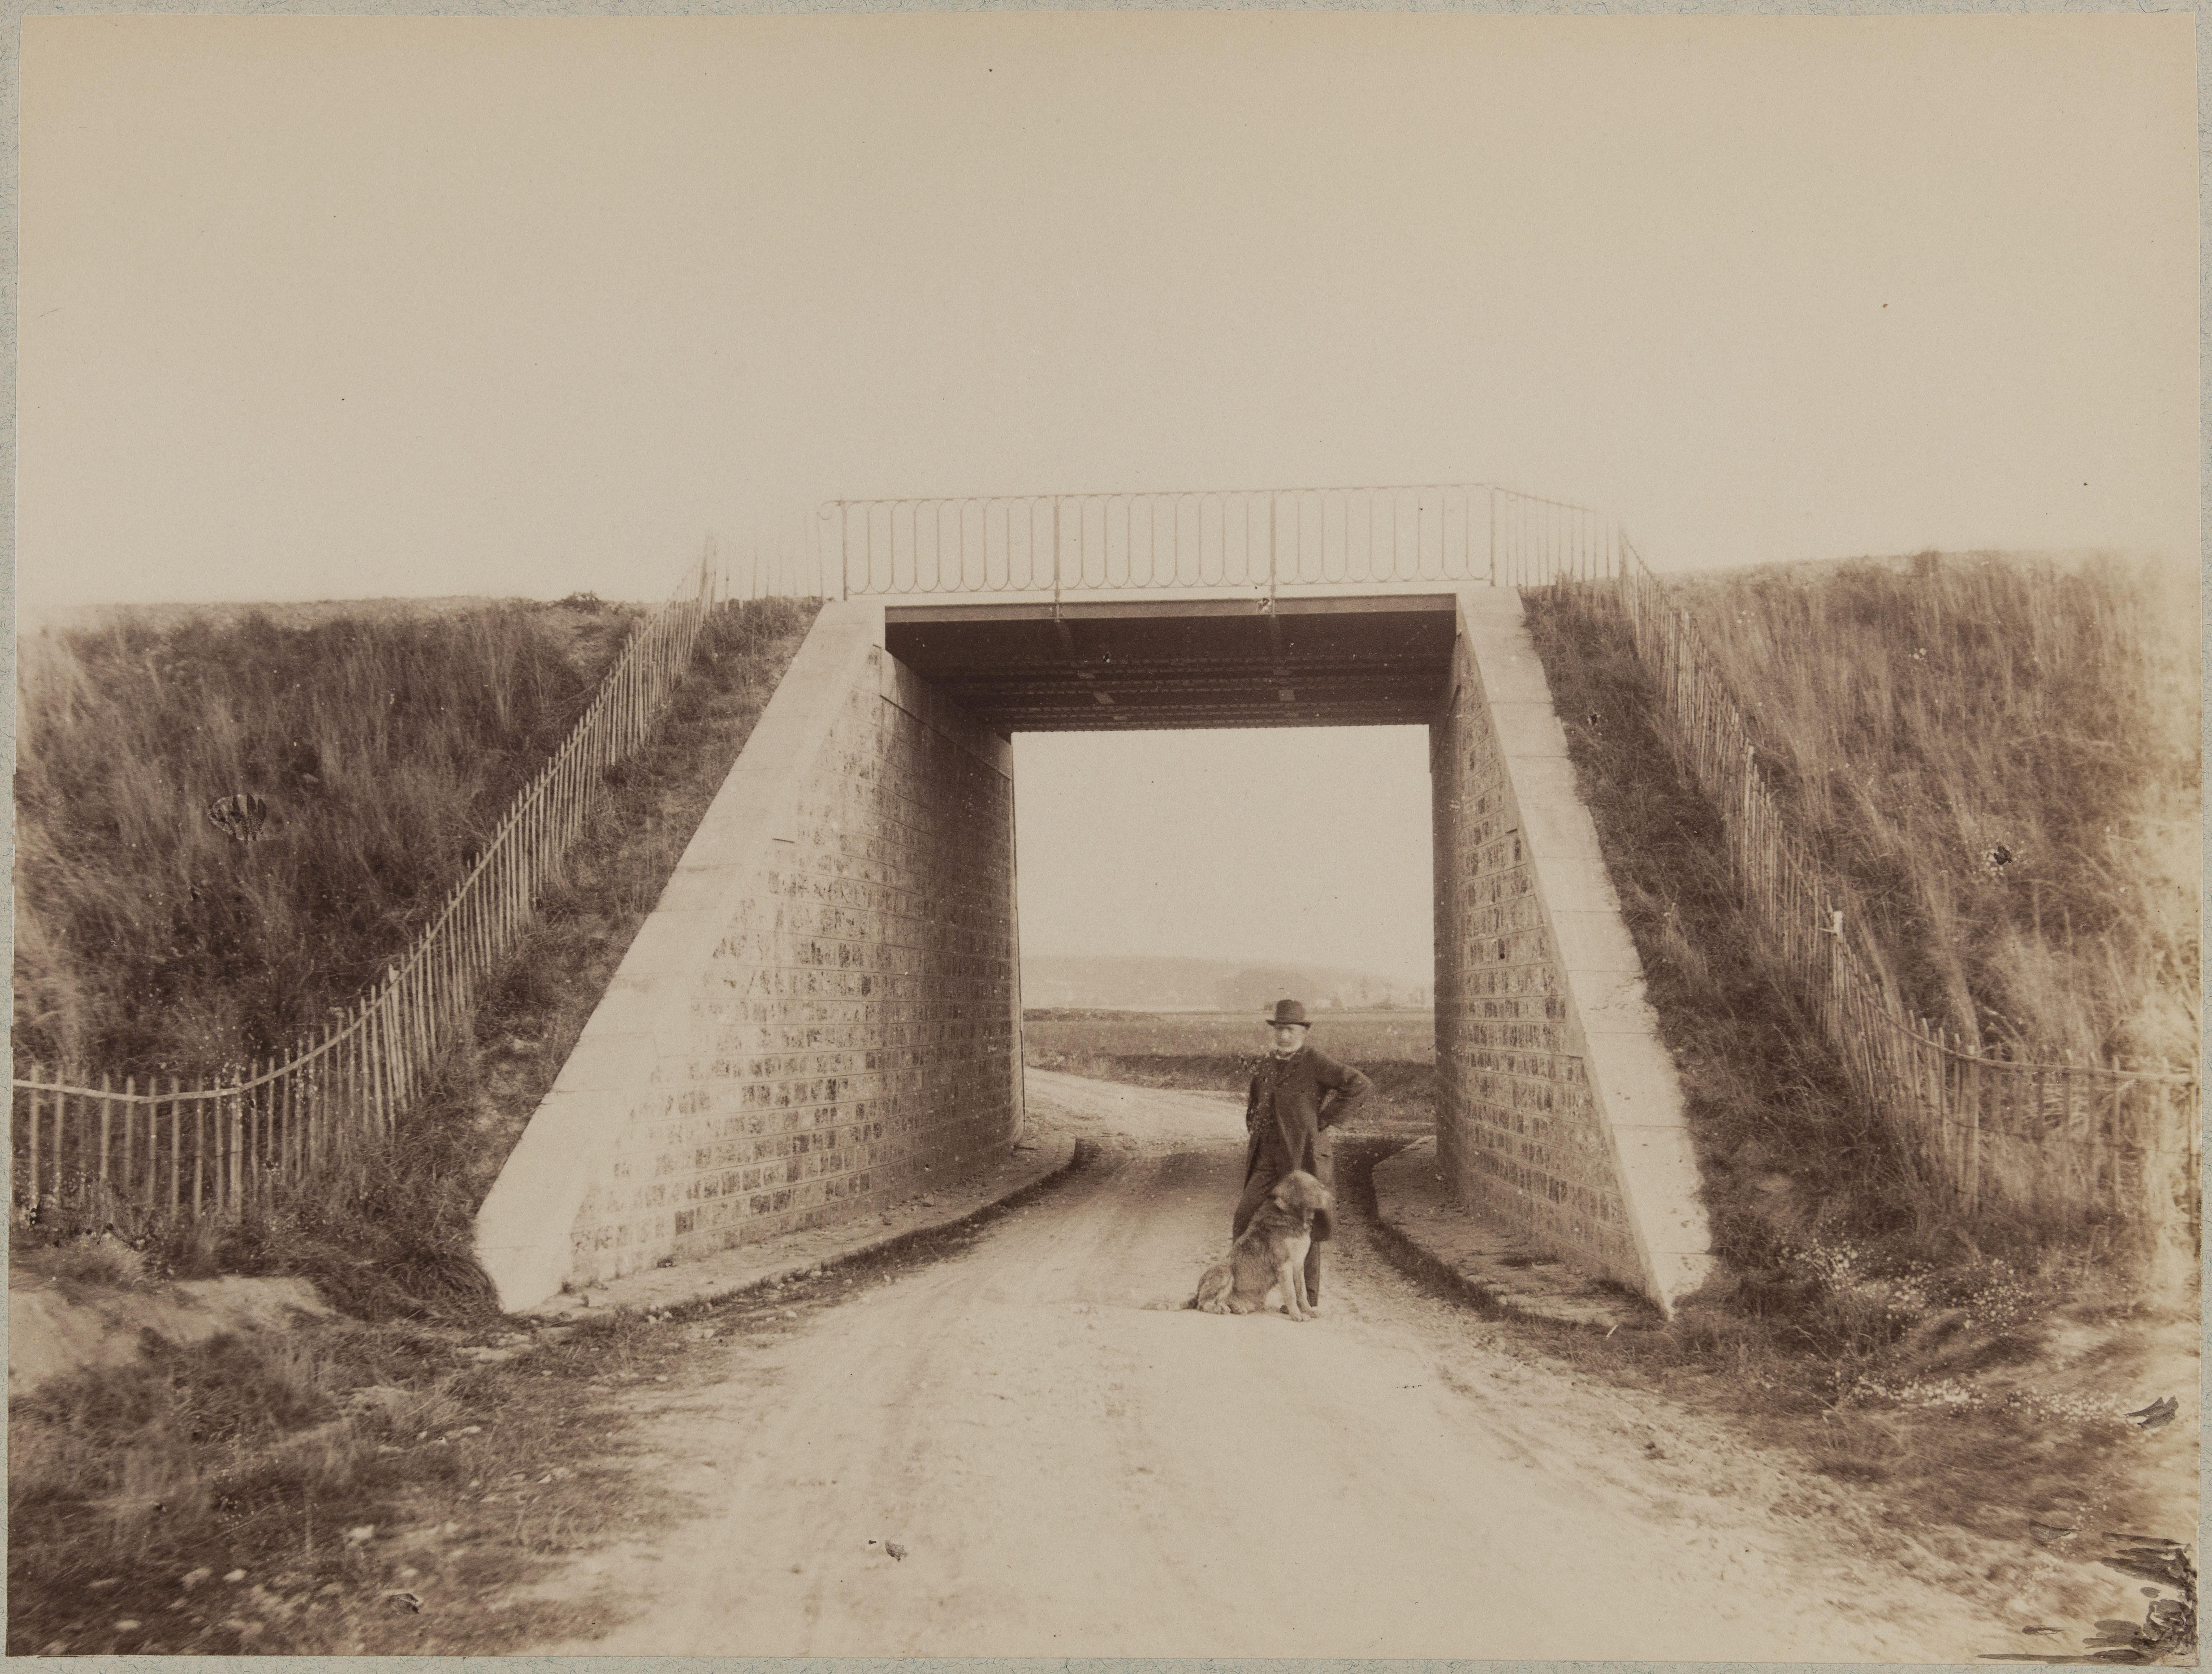 Путепровод на дороге из Шуази-ле-Руа в Вильнёв-Сен-Жорж